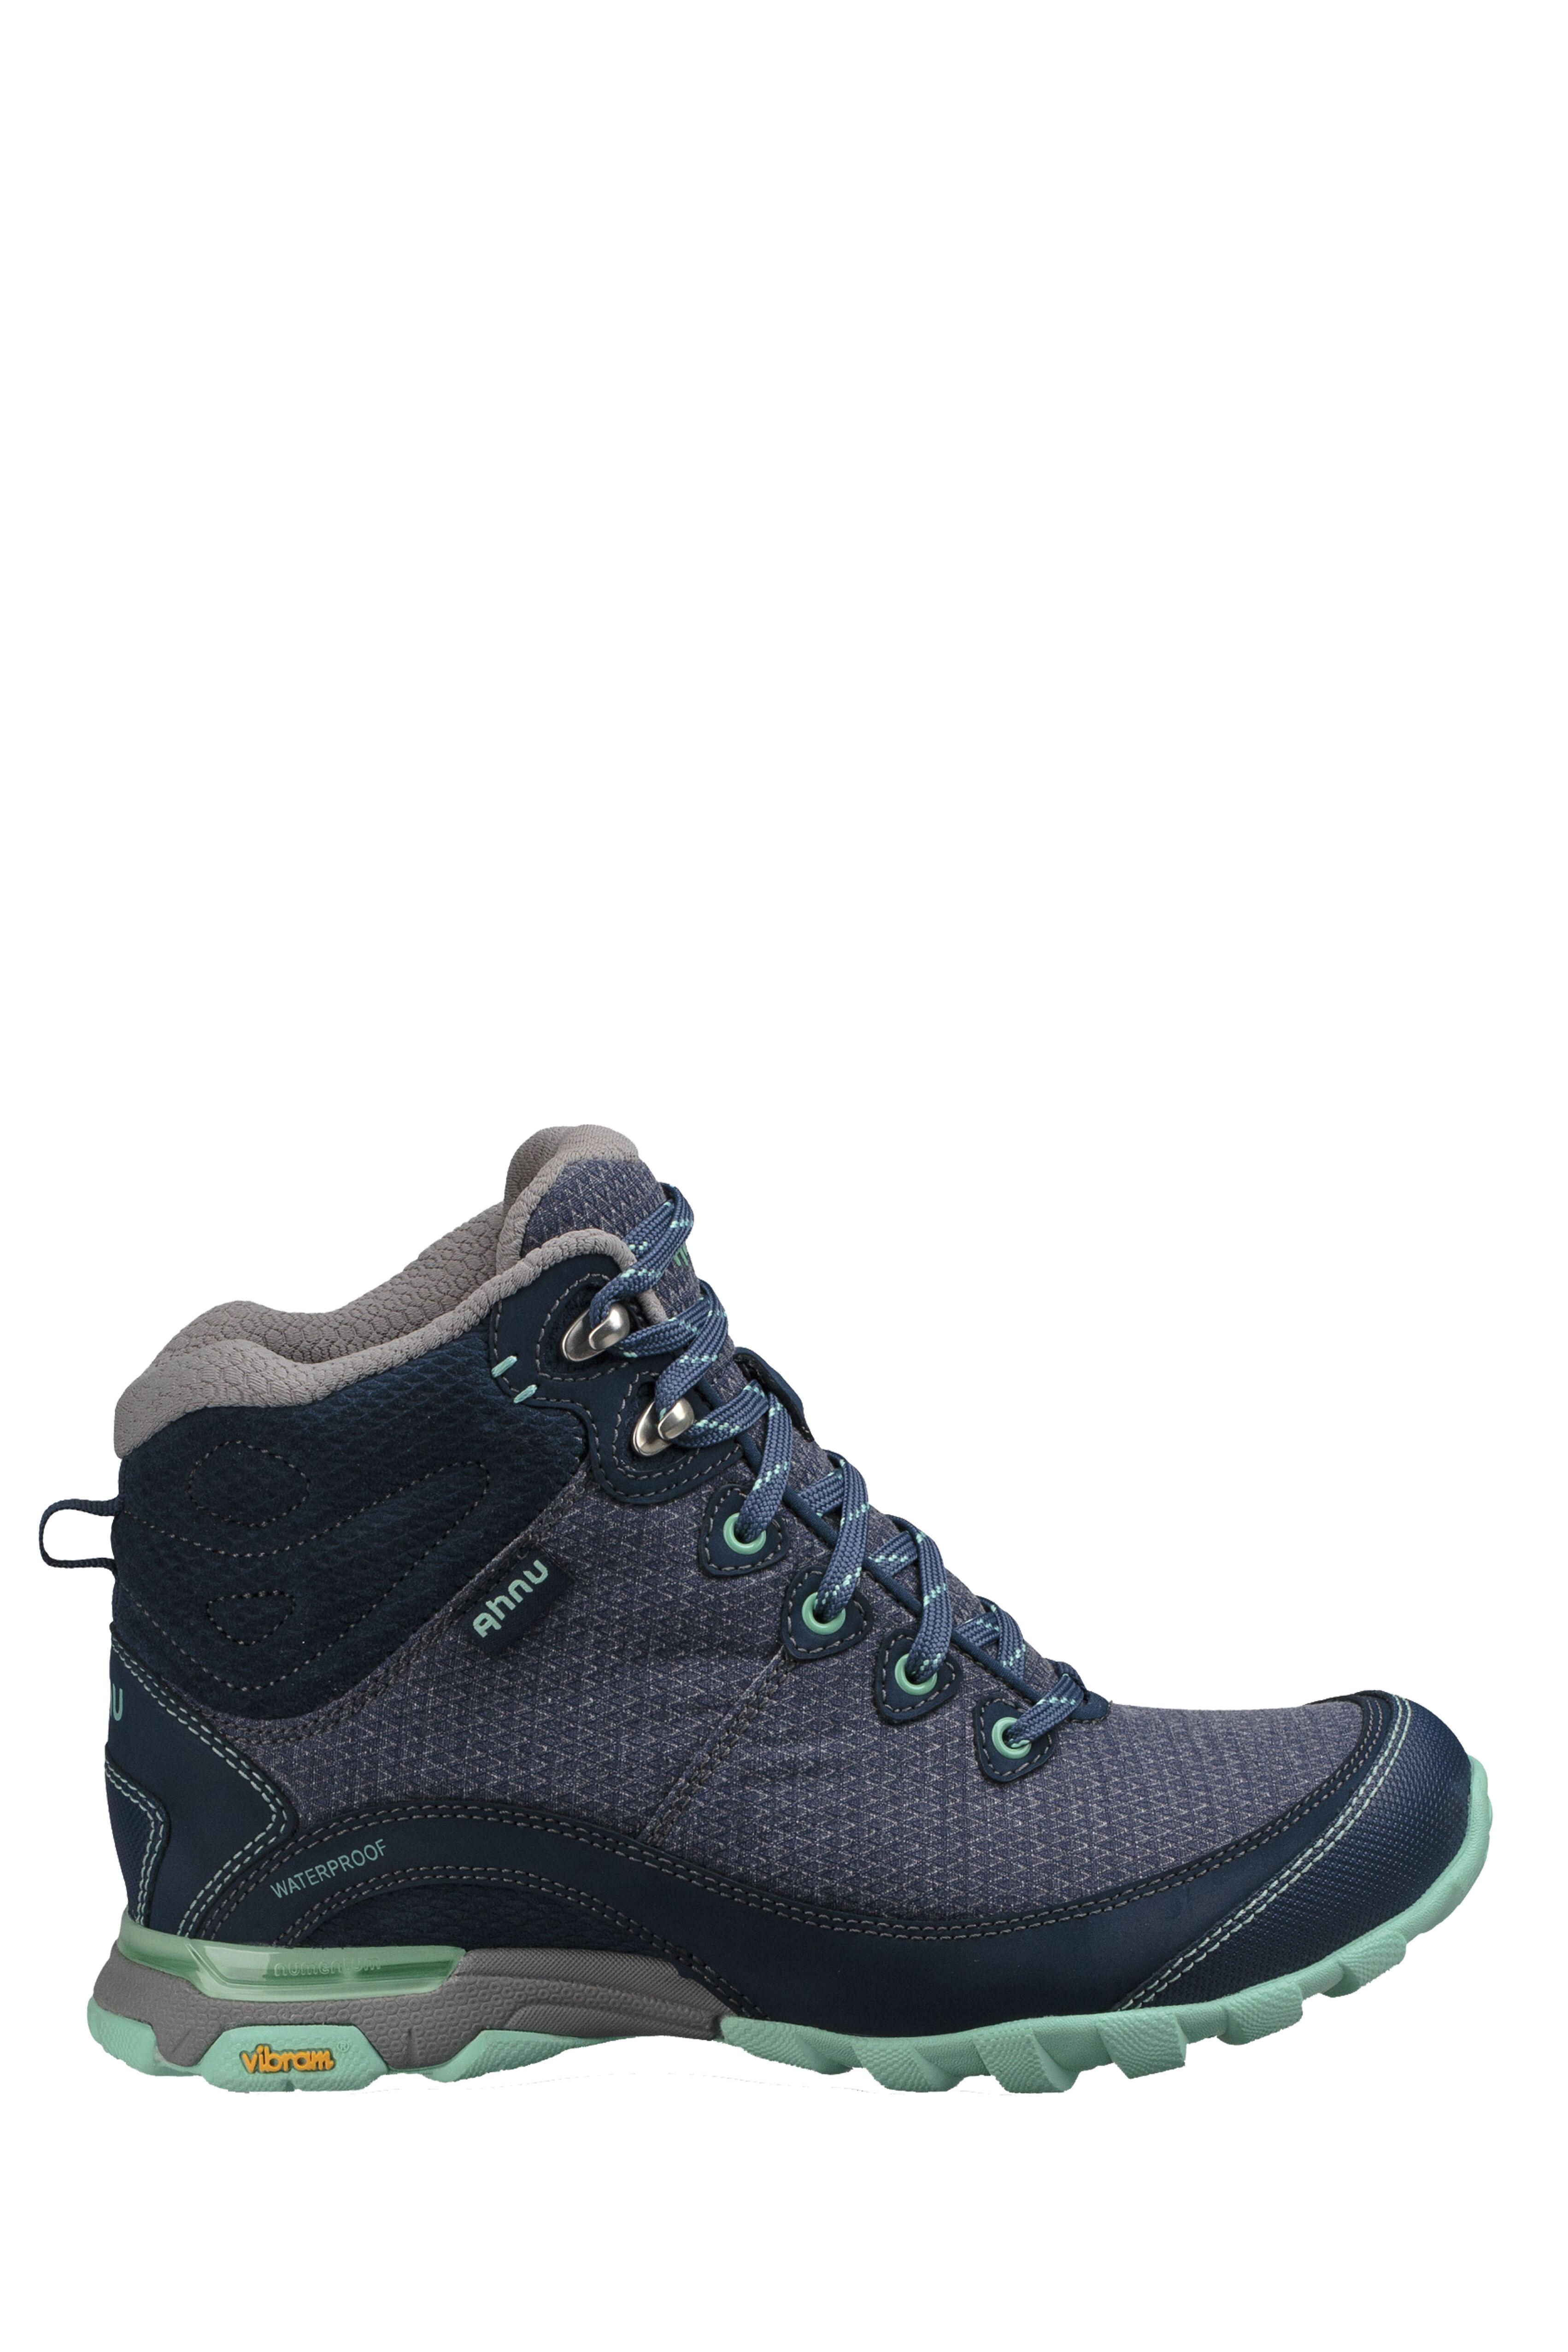 Ahnu Sugarpine II WP Boots - Women's